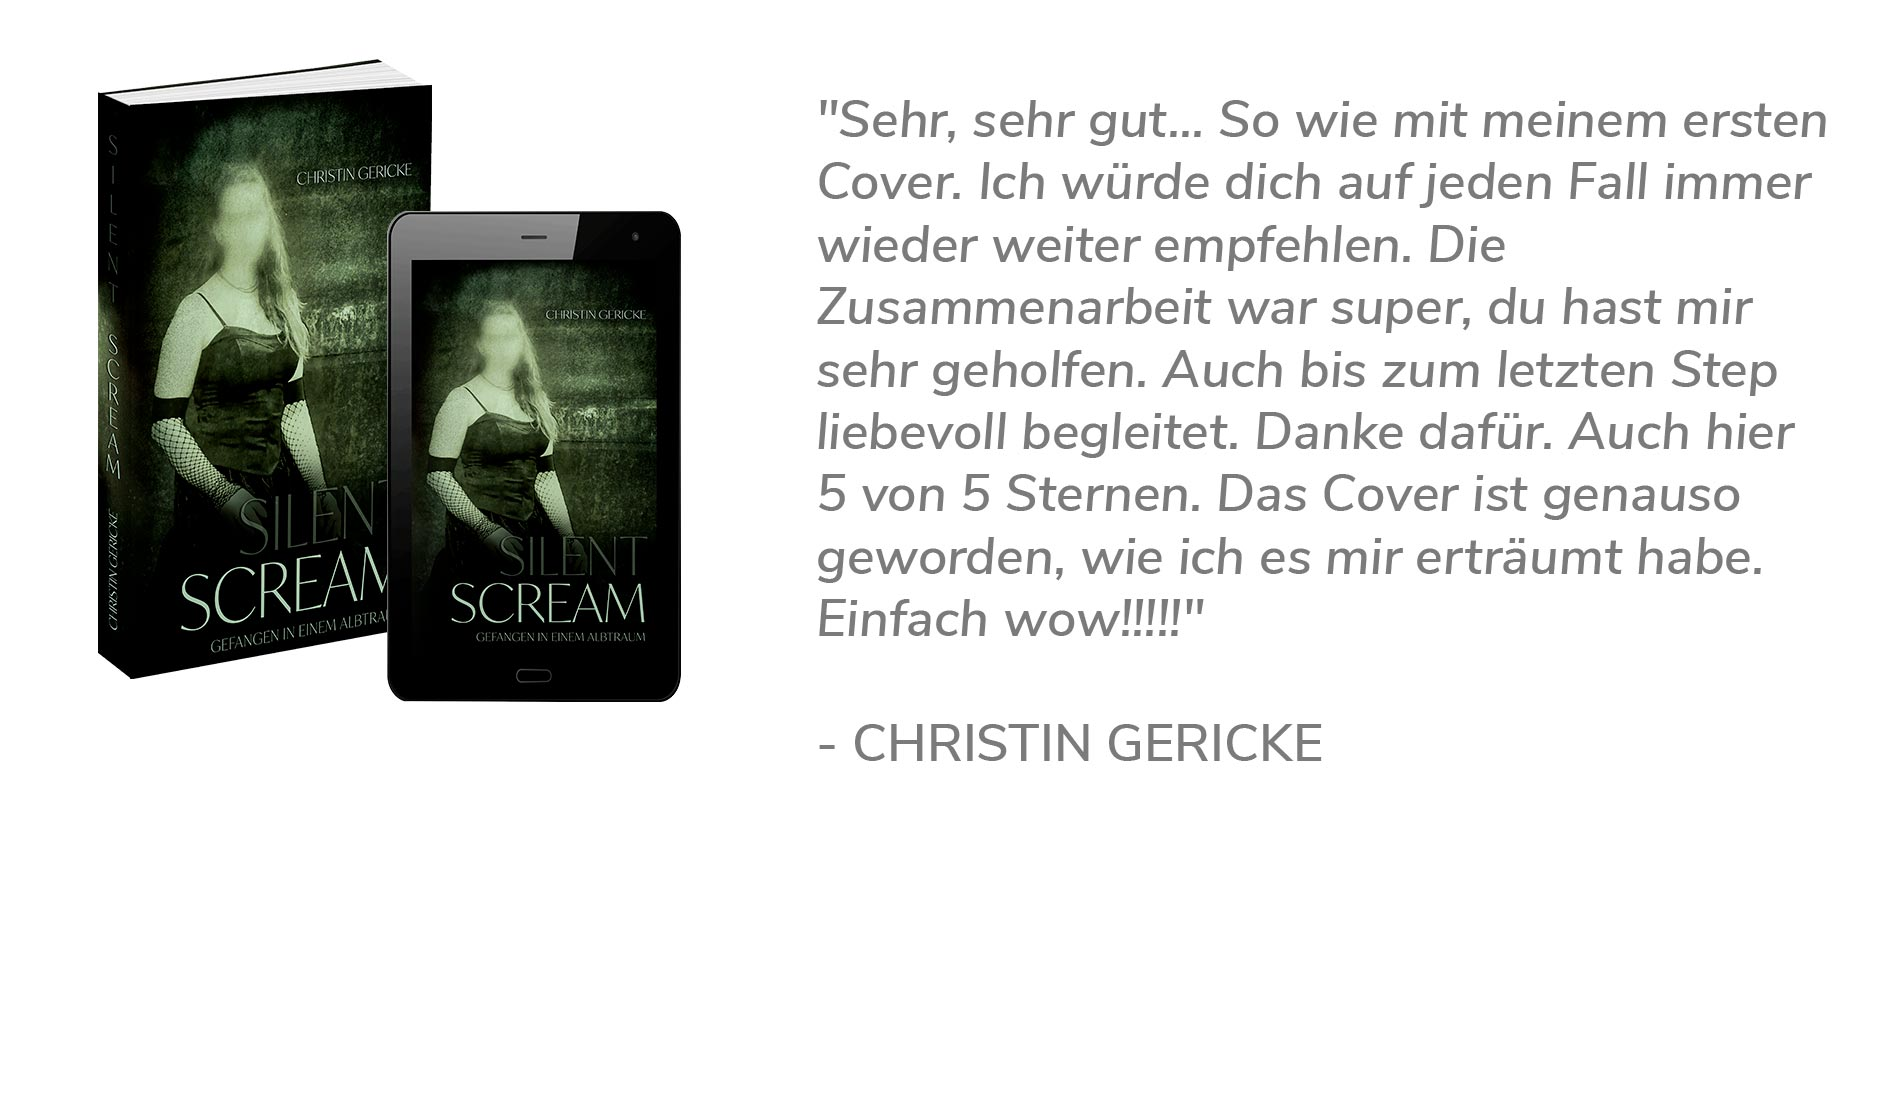 christin-gericke-2